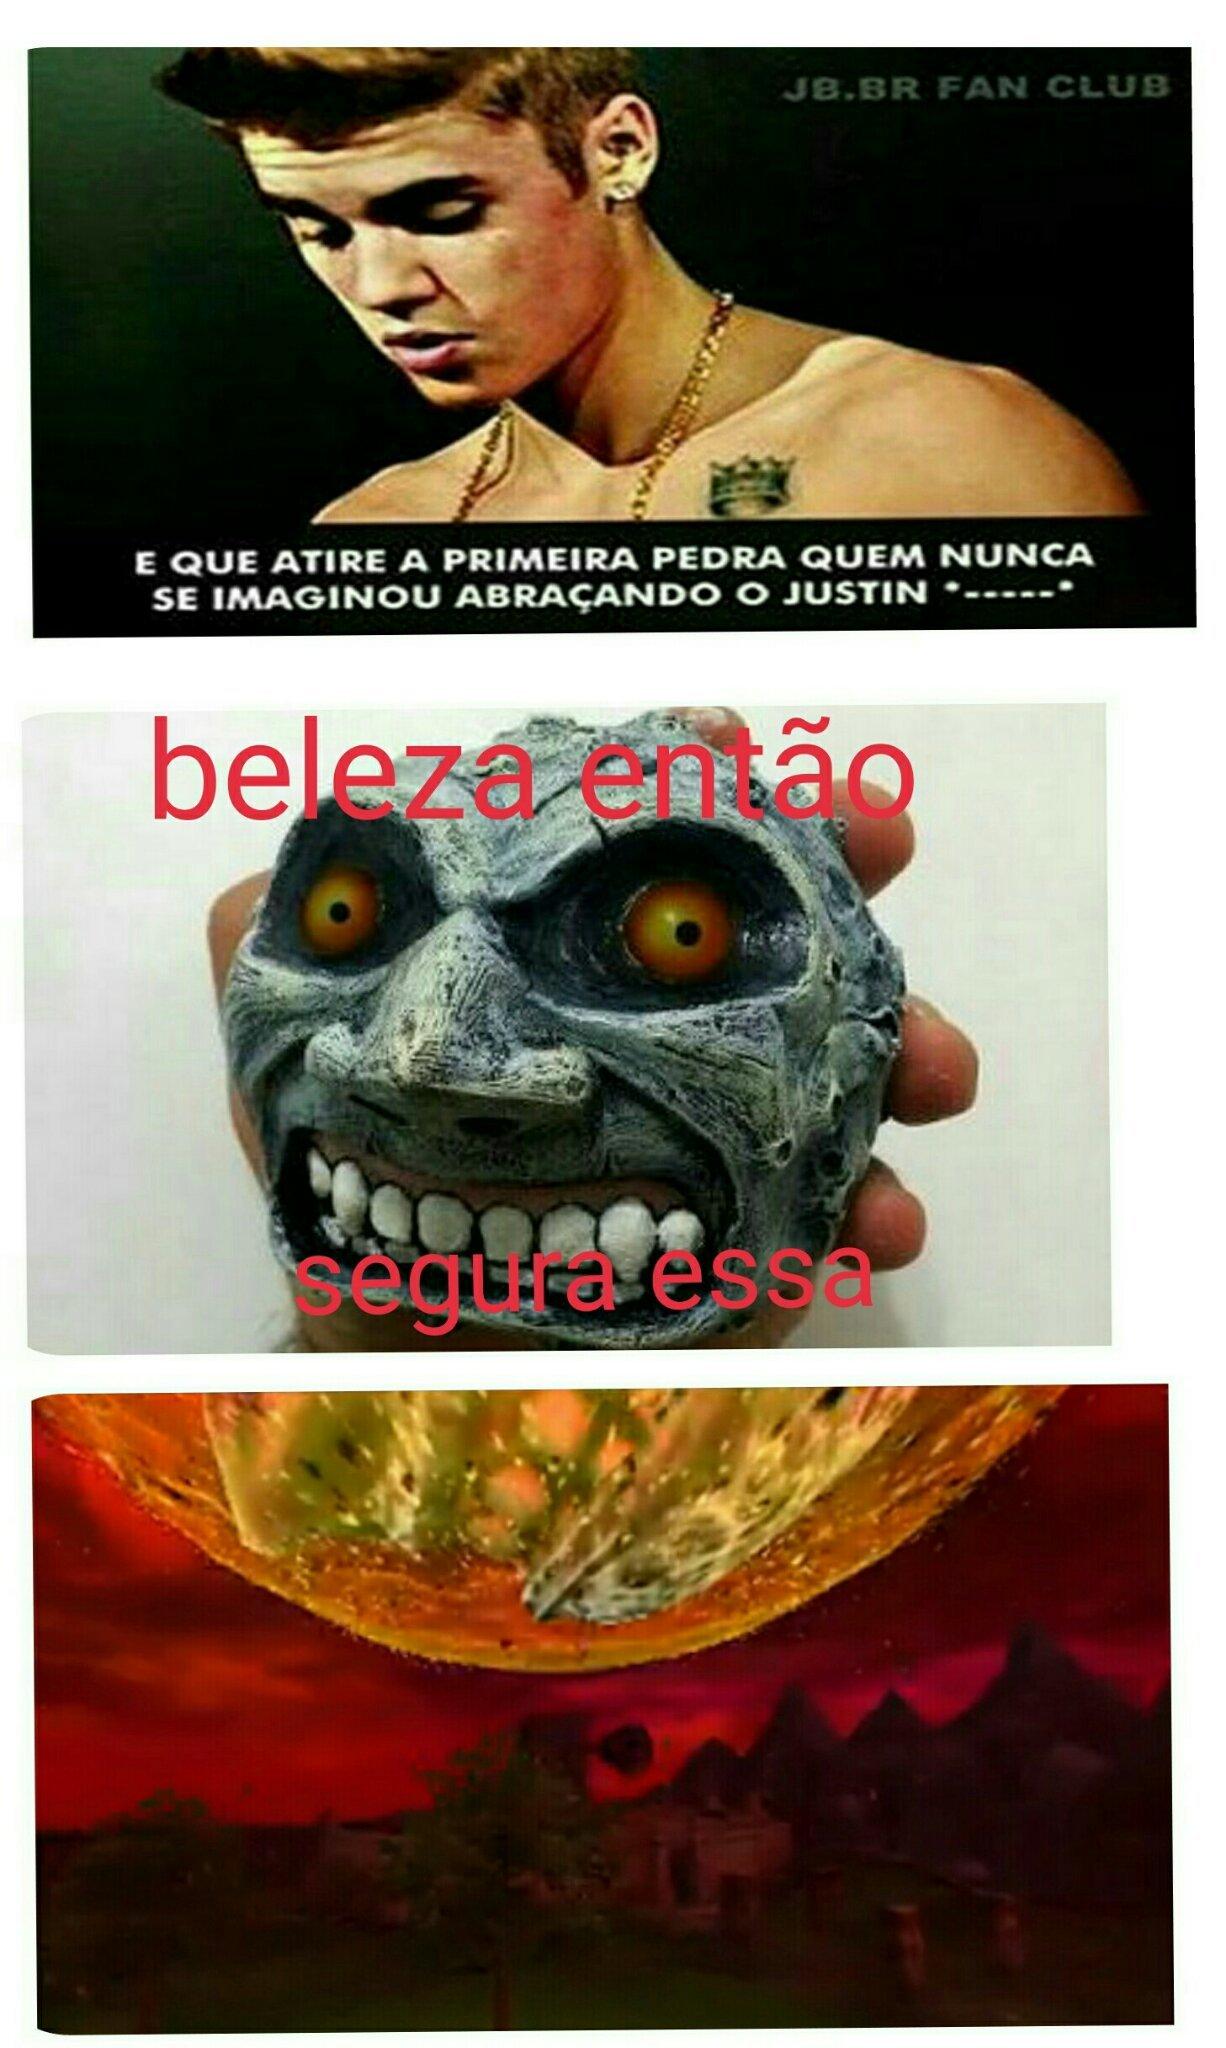 Aoooooo 2 - meme